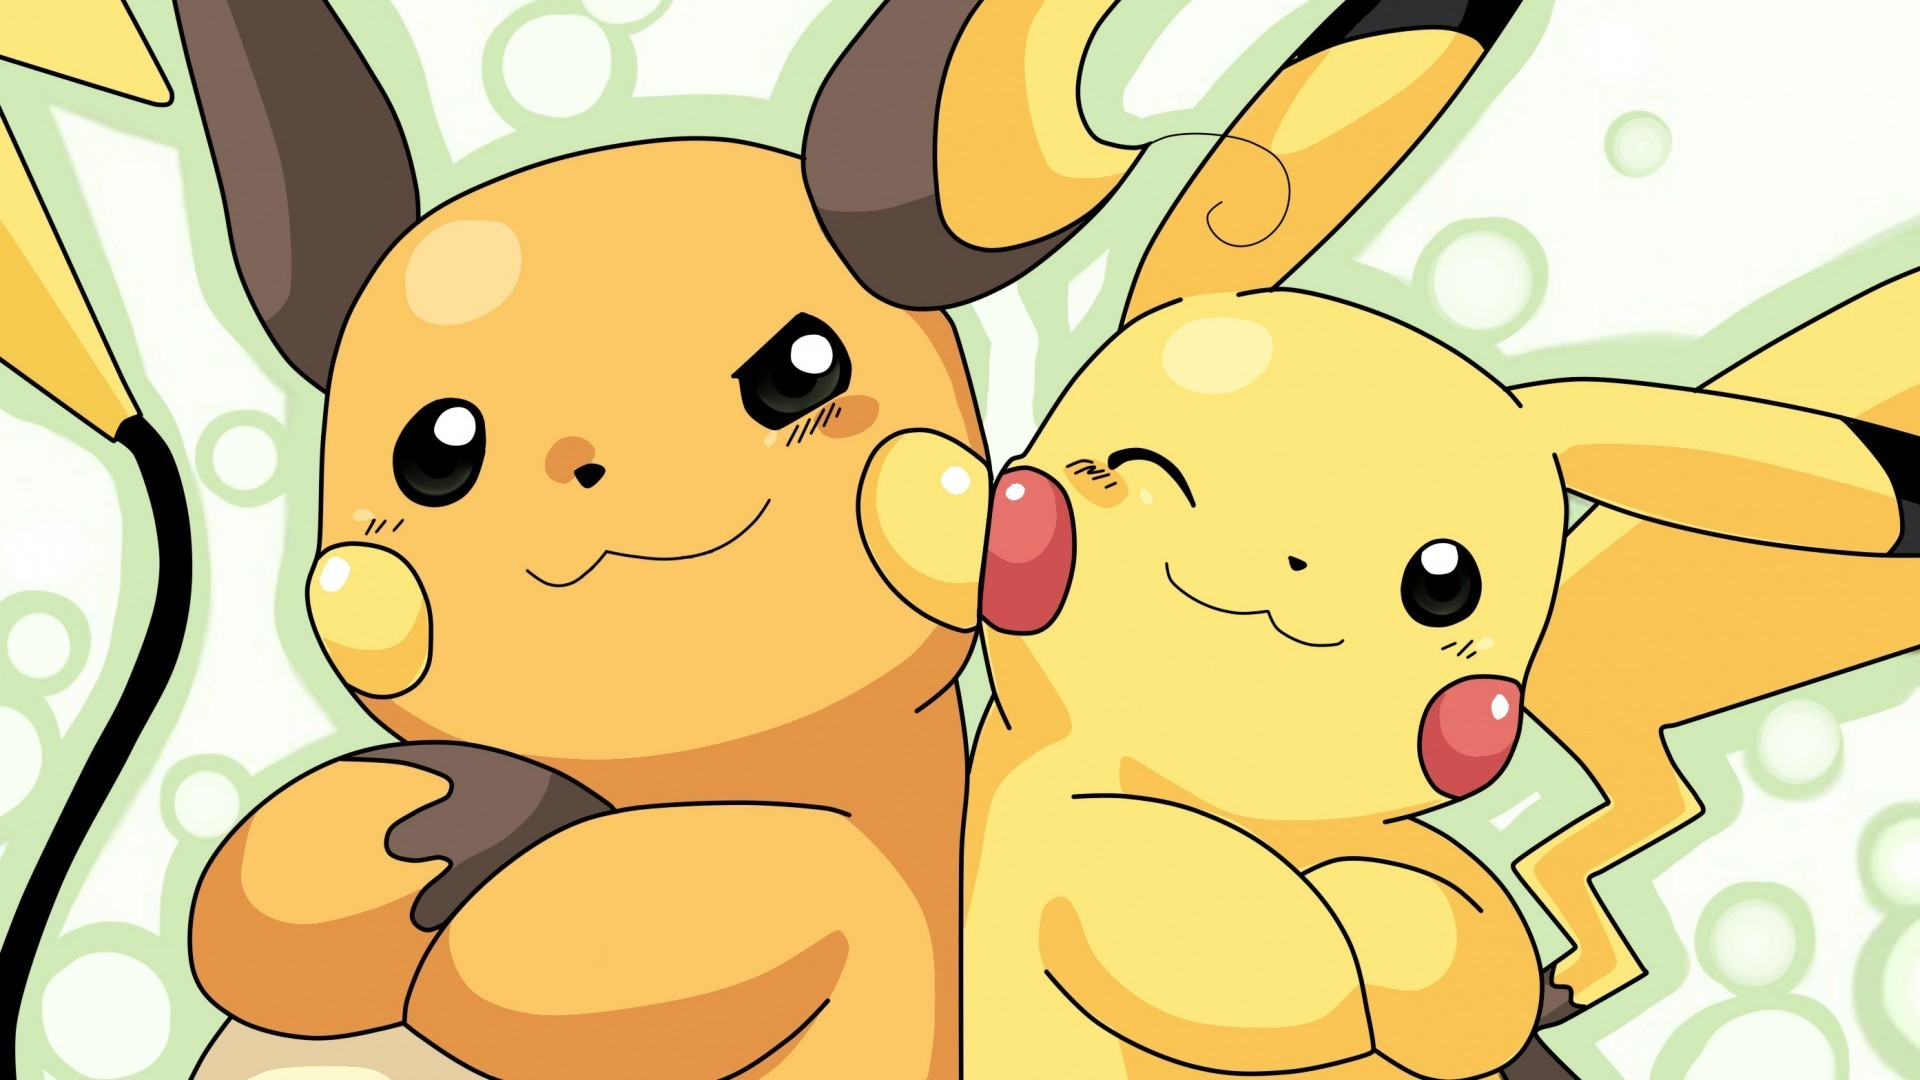 Wallpaper Pikachu y Raichu